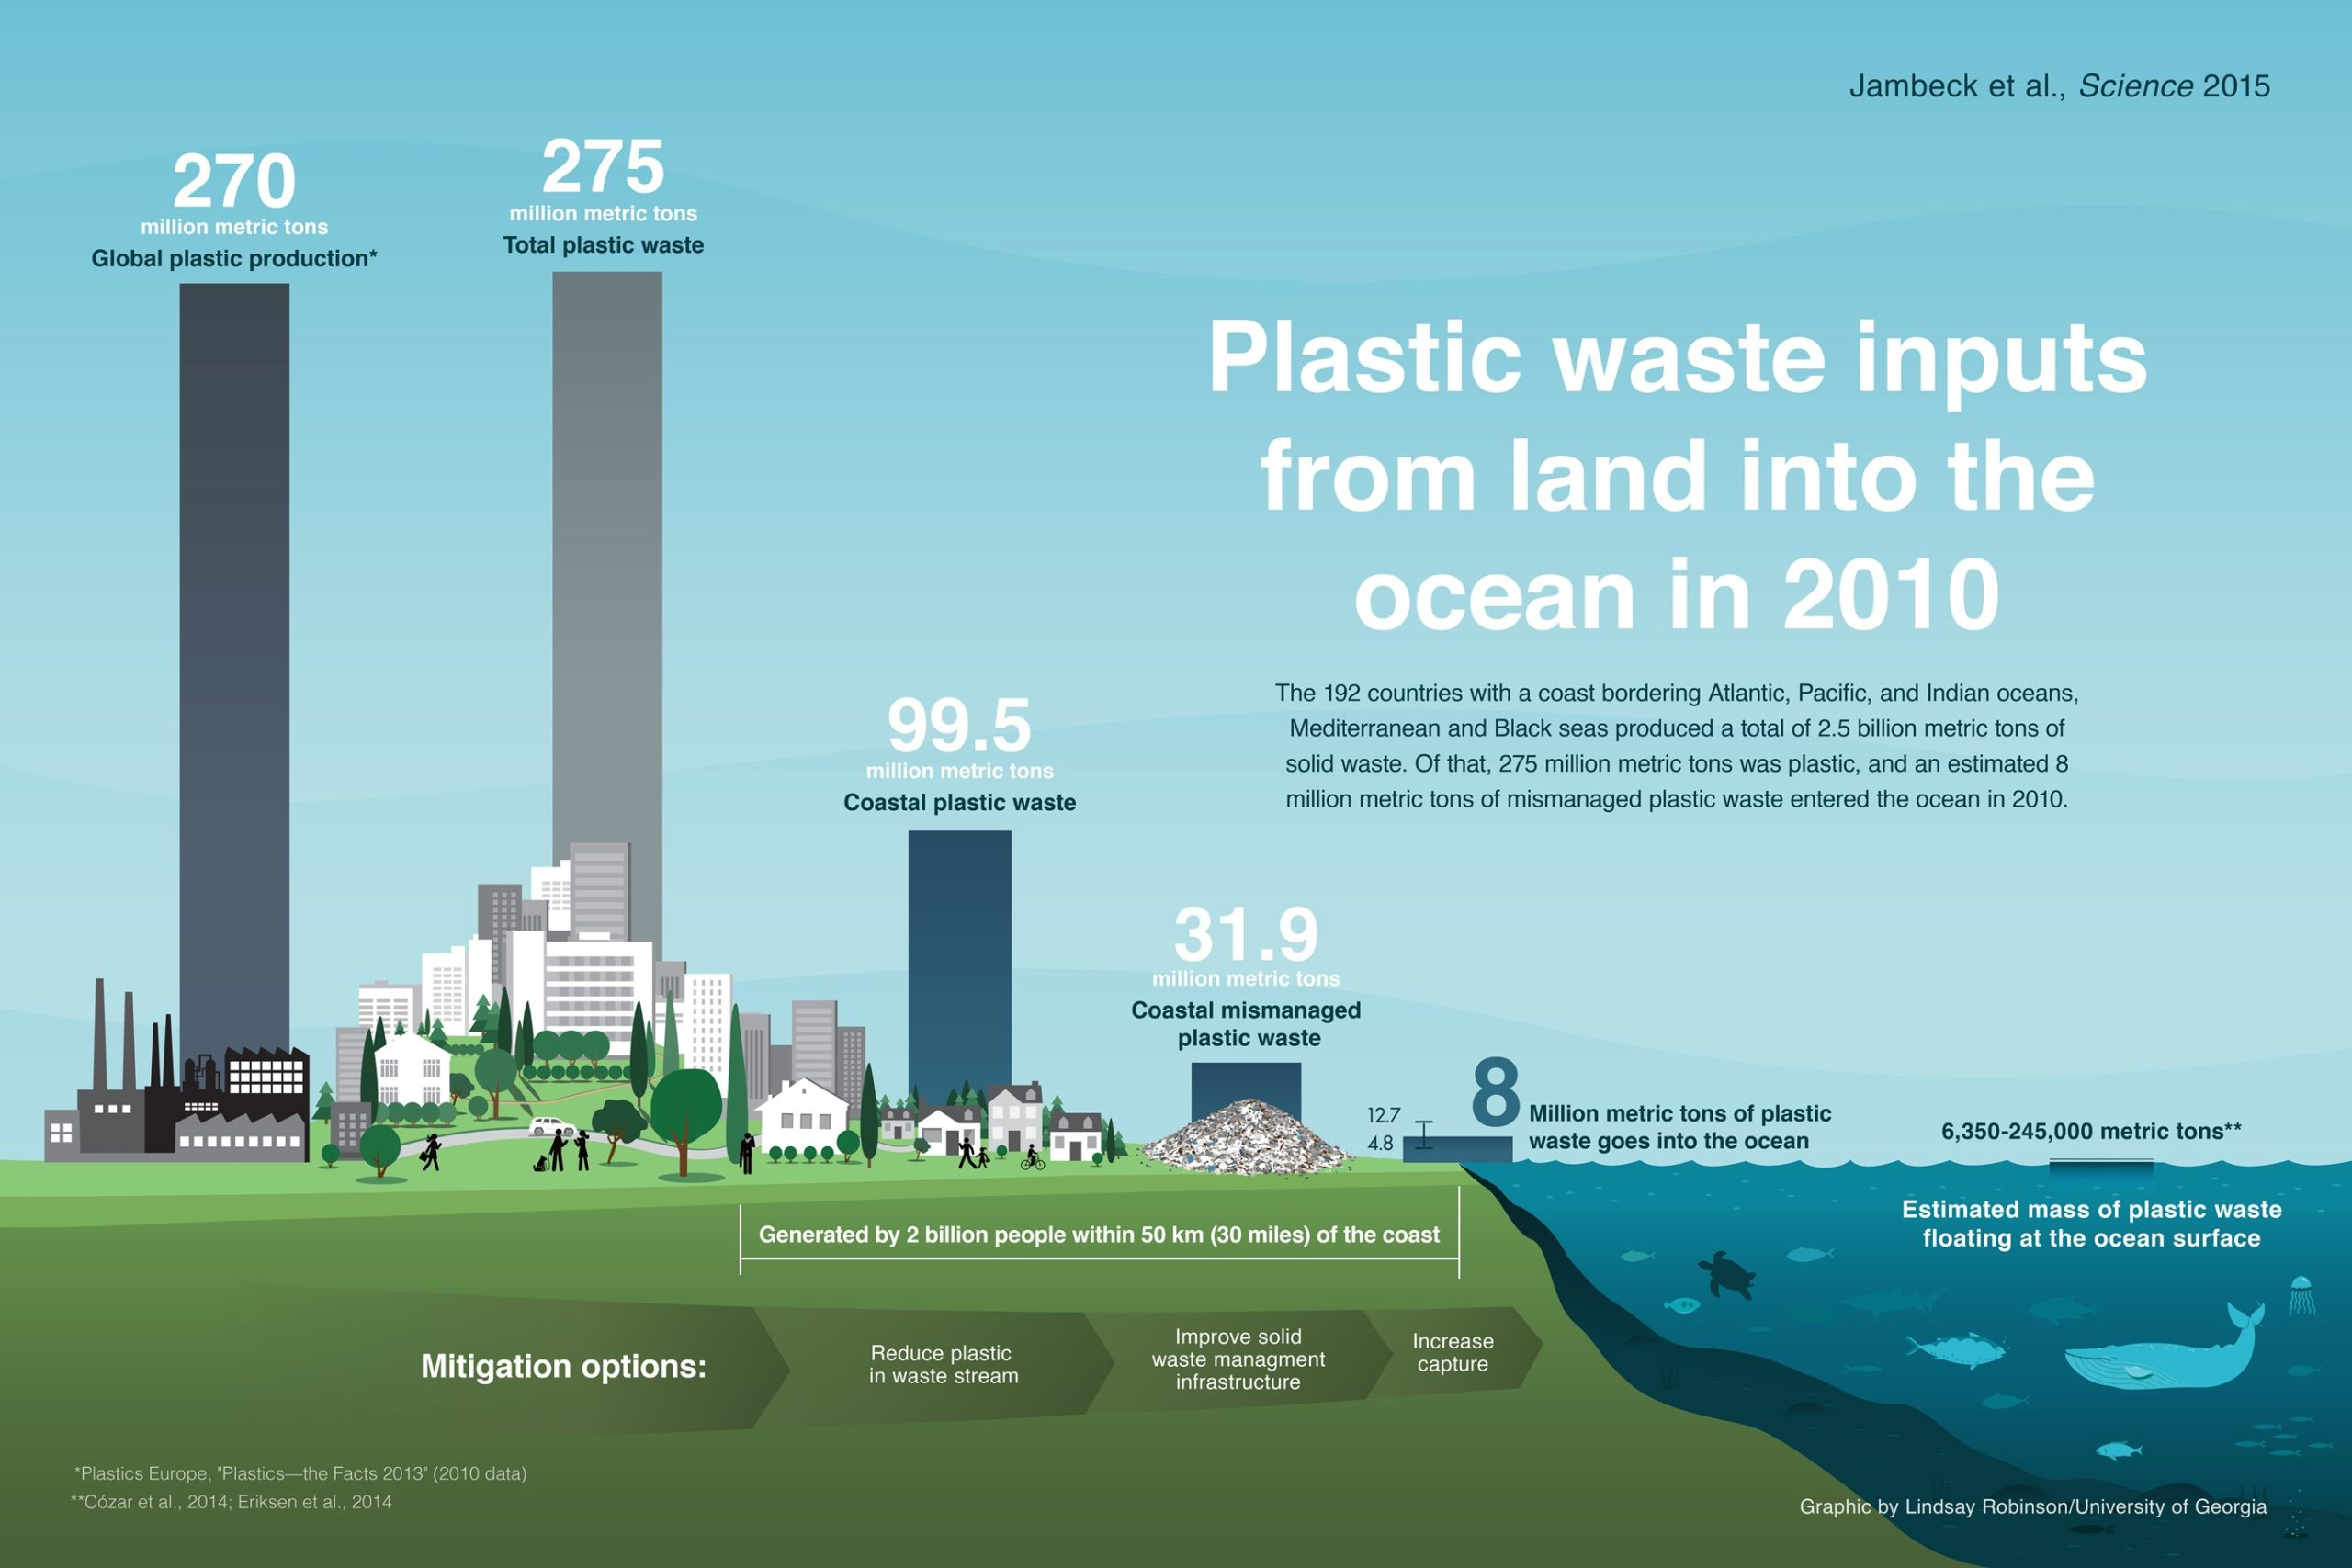 Plastikmüll Meer Problem Biomasse Jambeck 2015